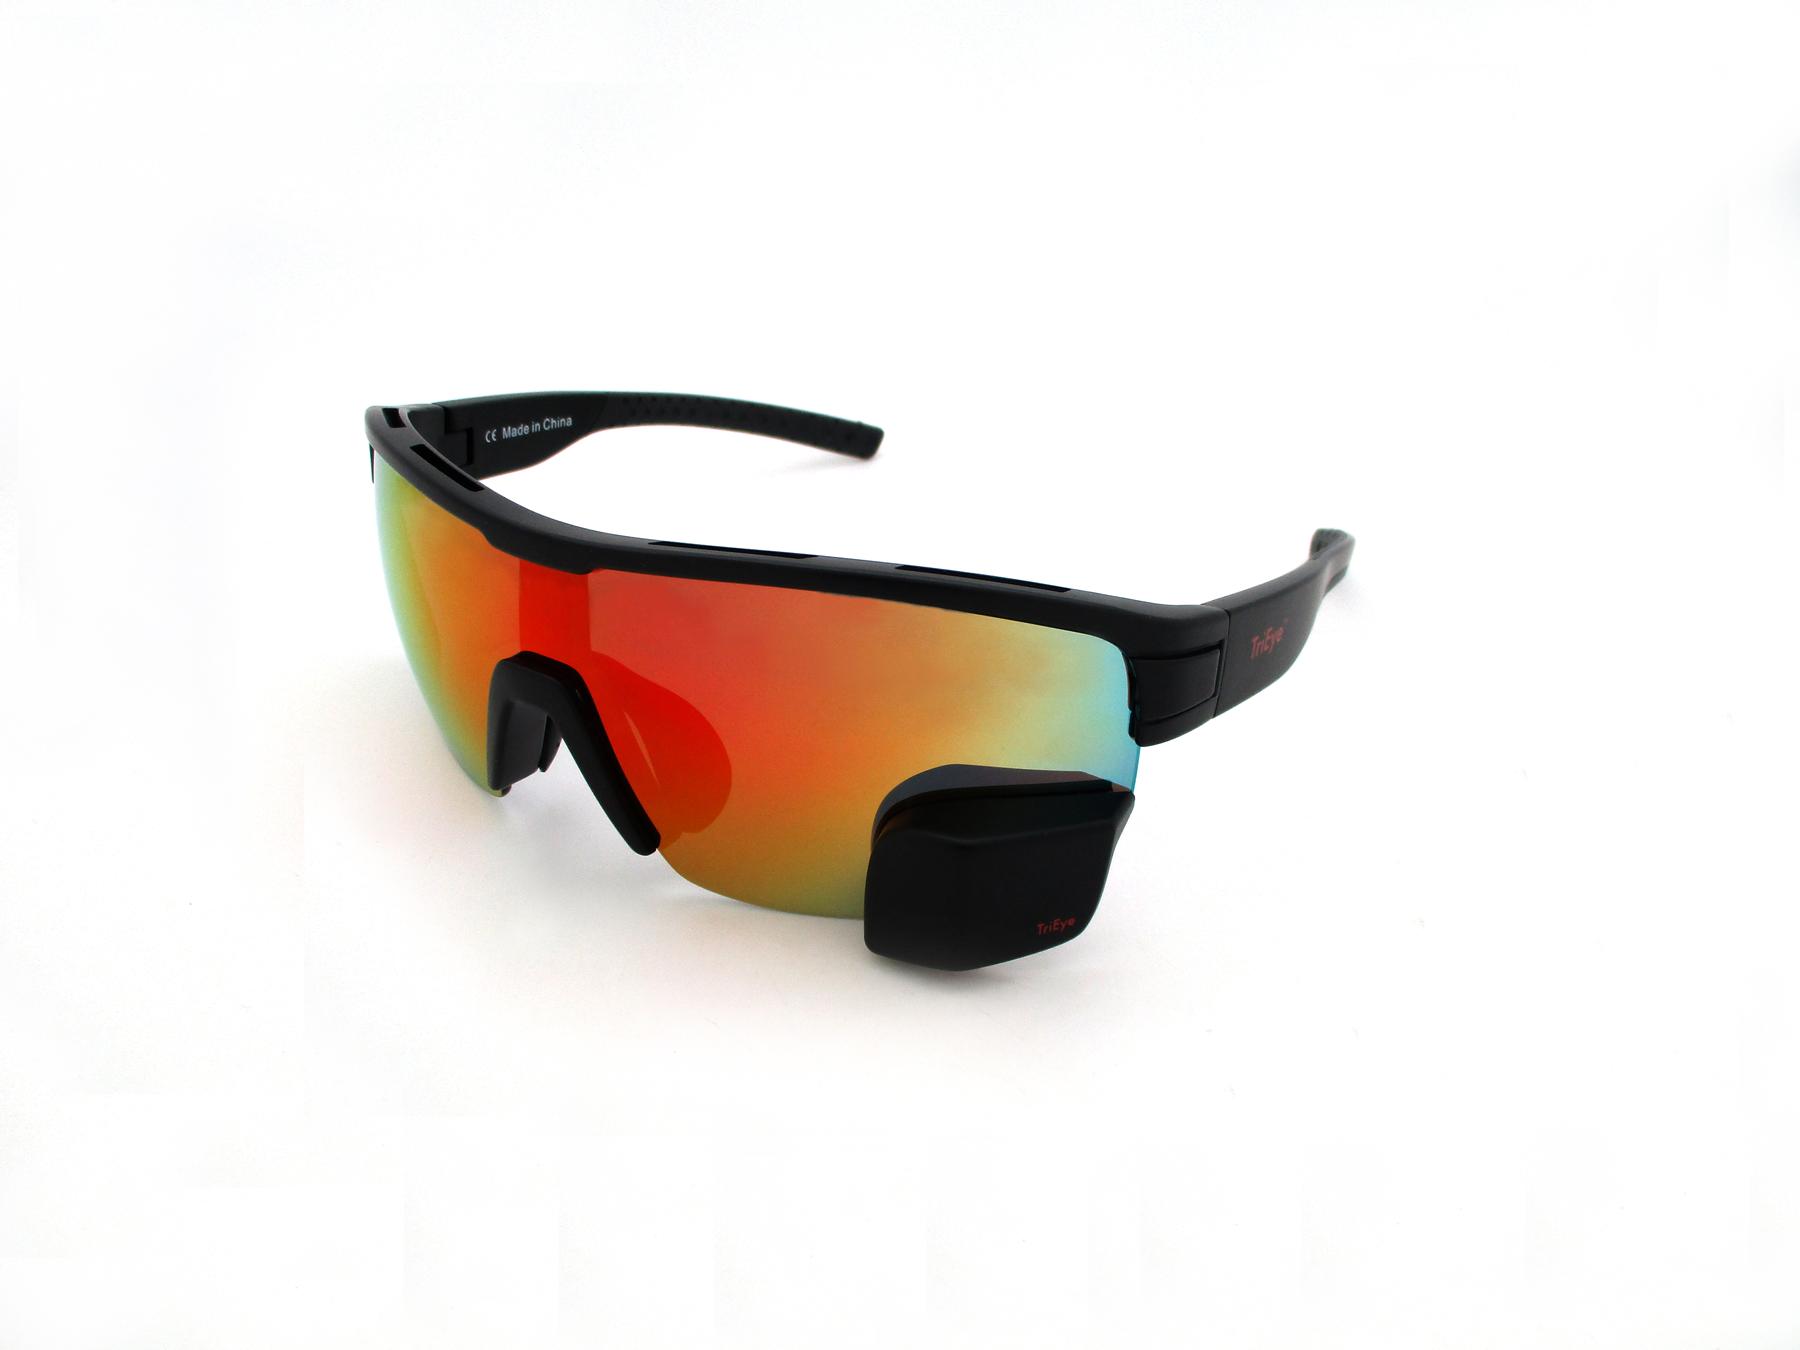 TriEye Eyewear With Integrated Rearview Mirror